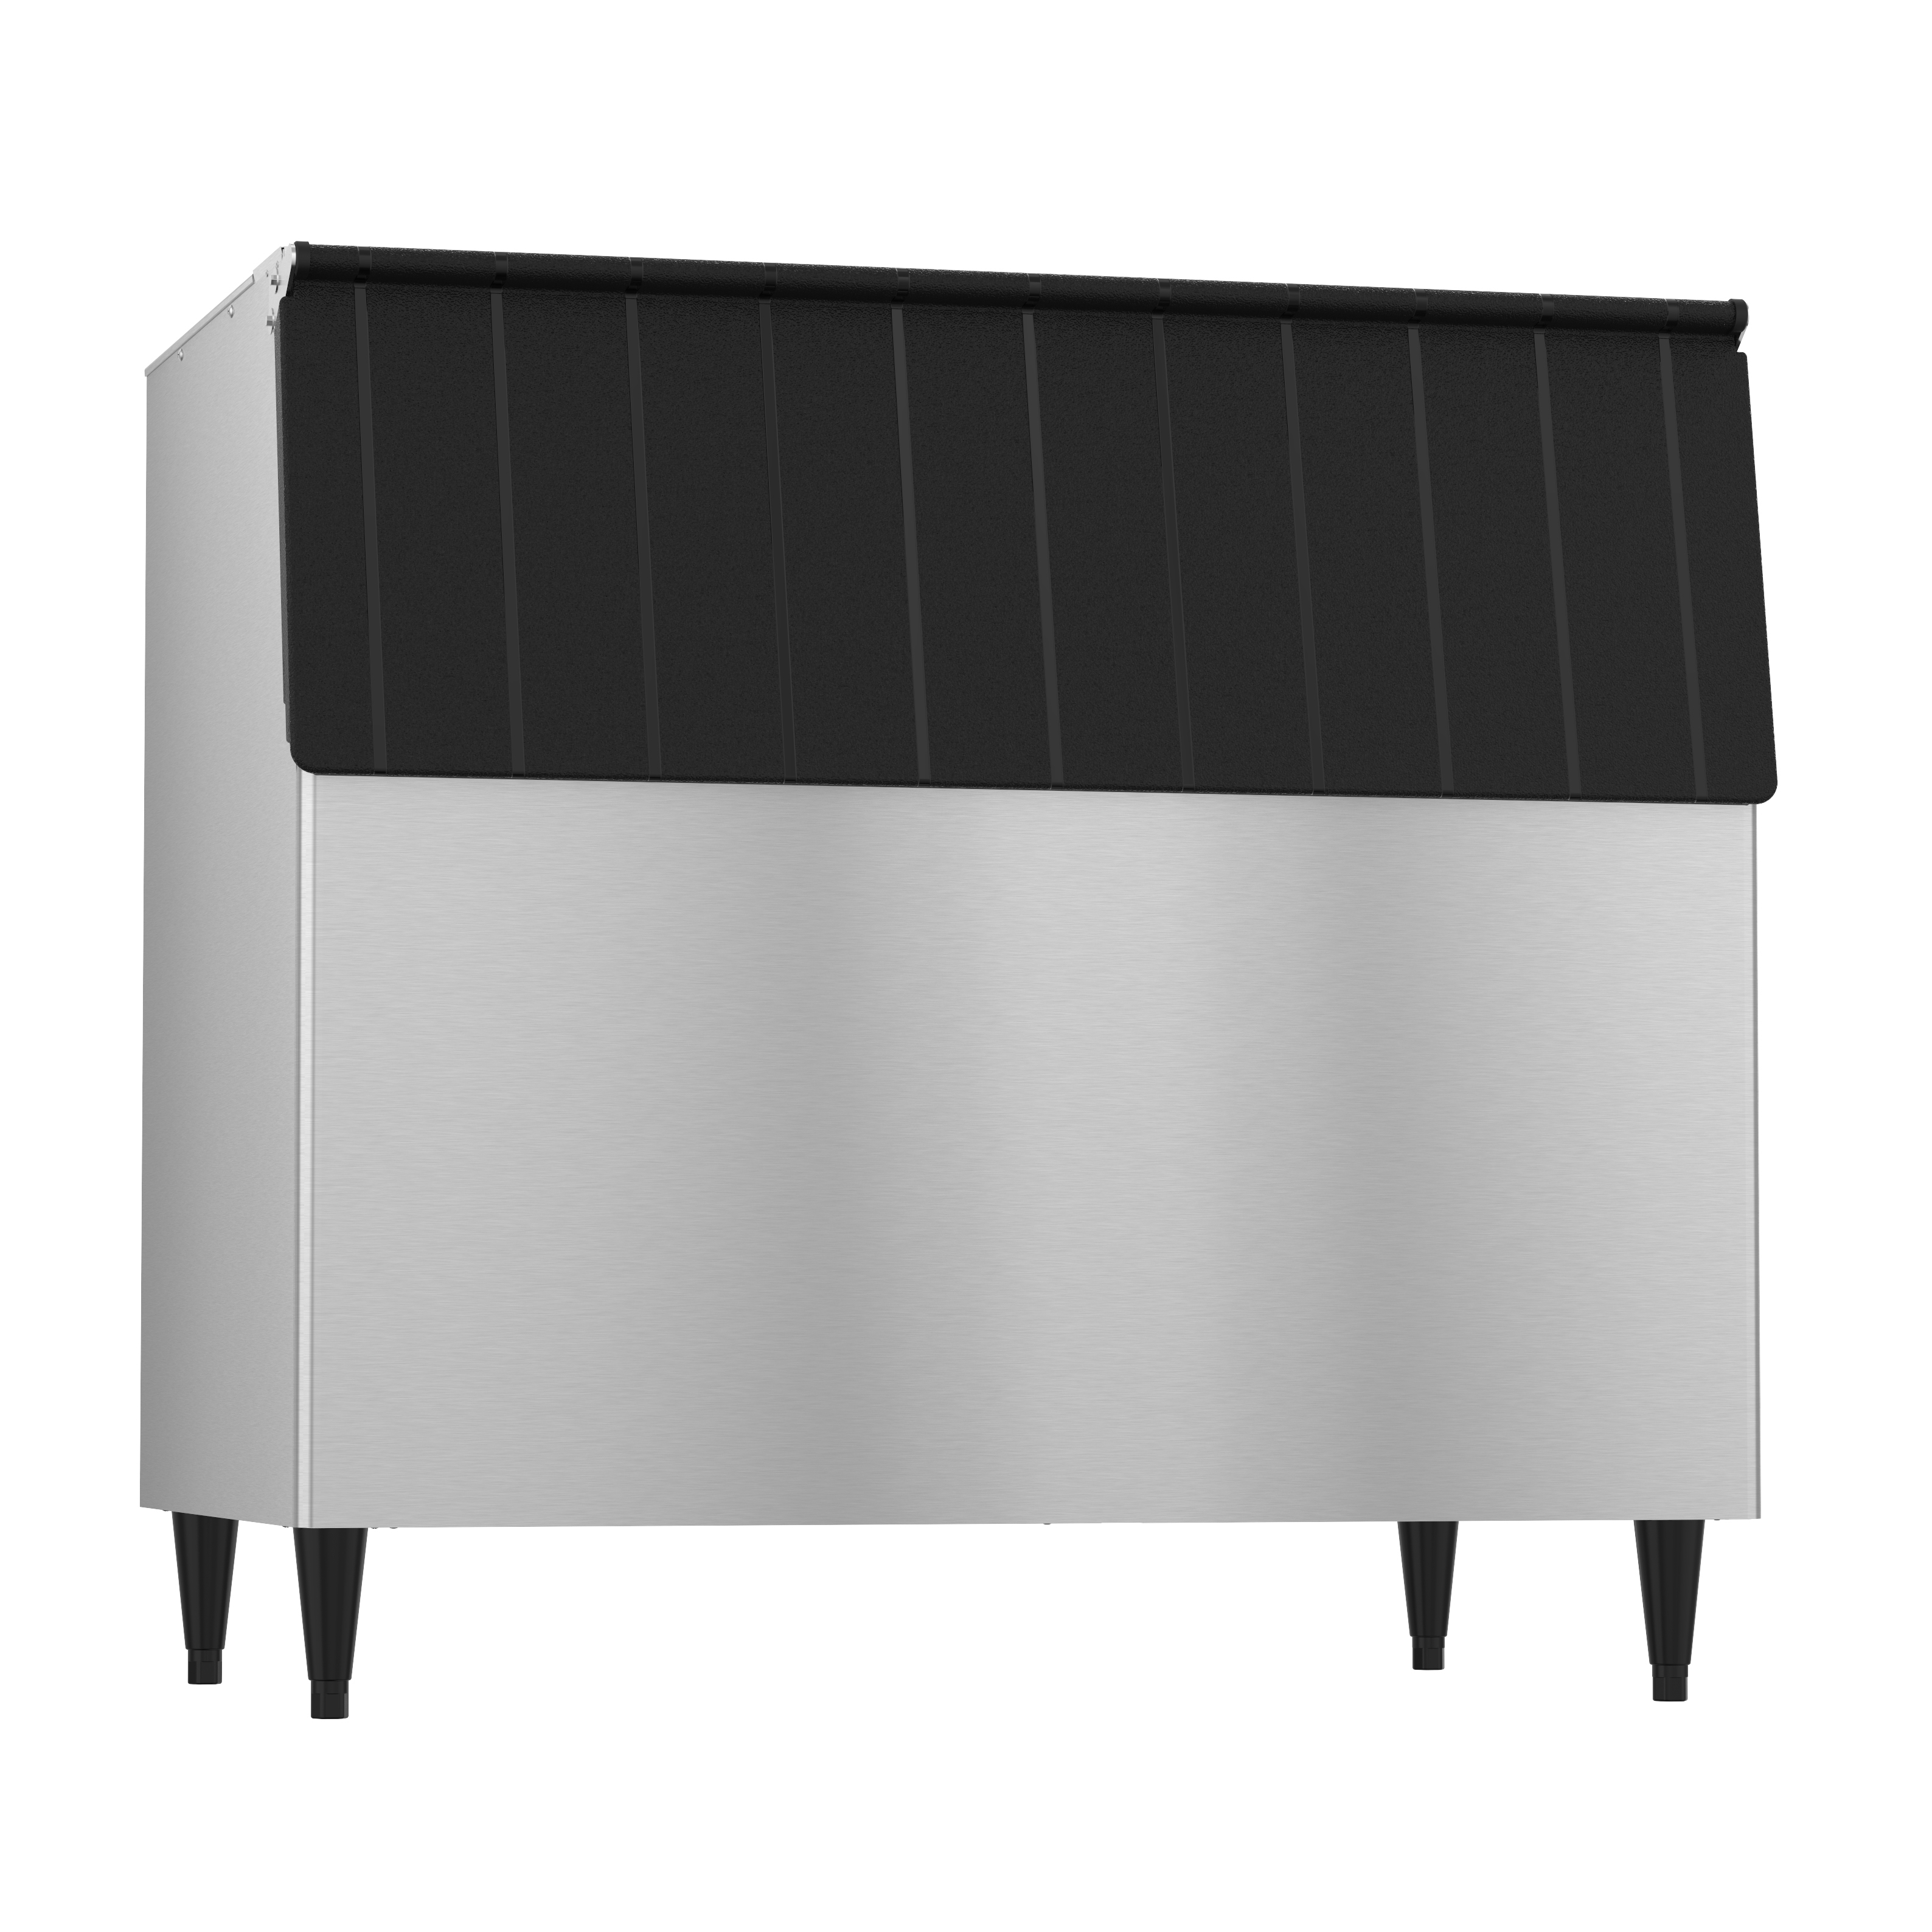 Hoshizaki B-800SF ice cubers, ice storage & ice dispensers